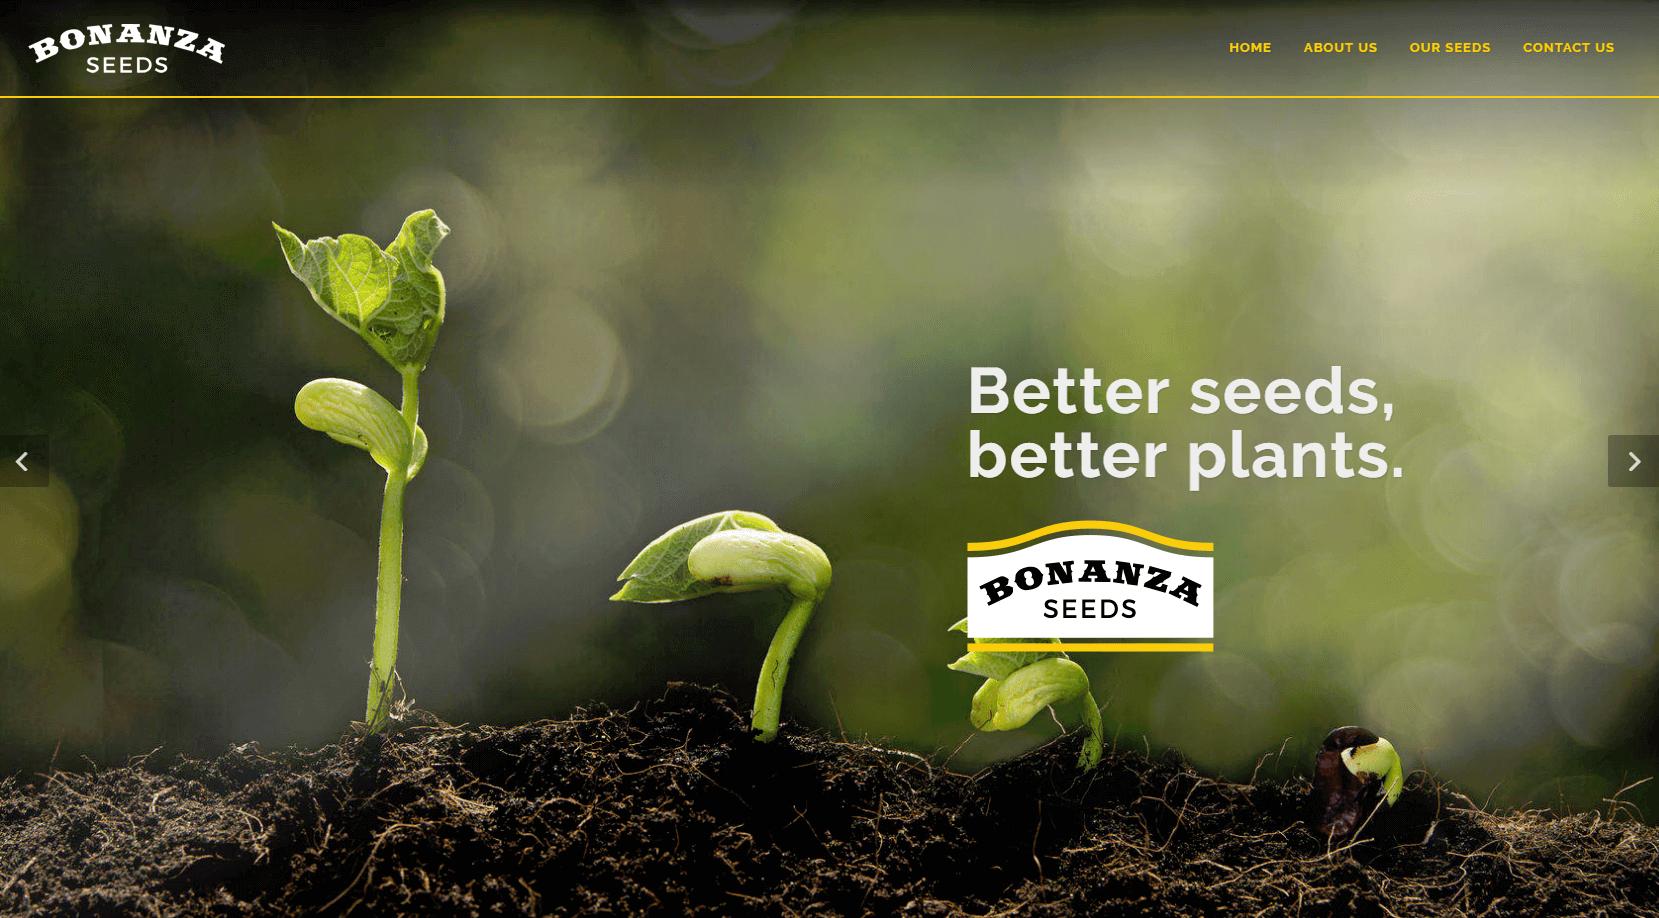 bonanza-seeds